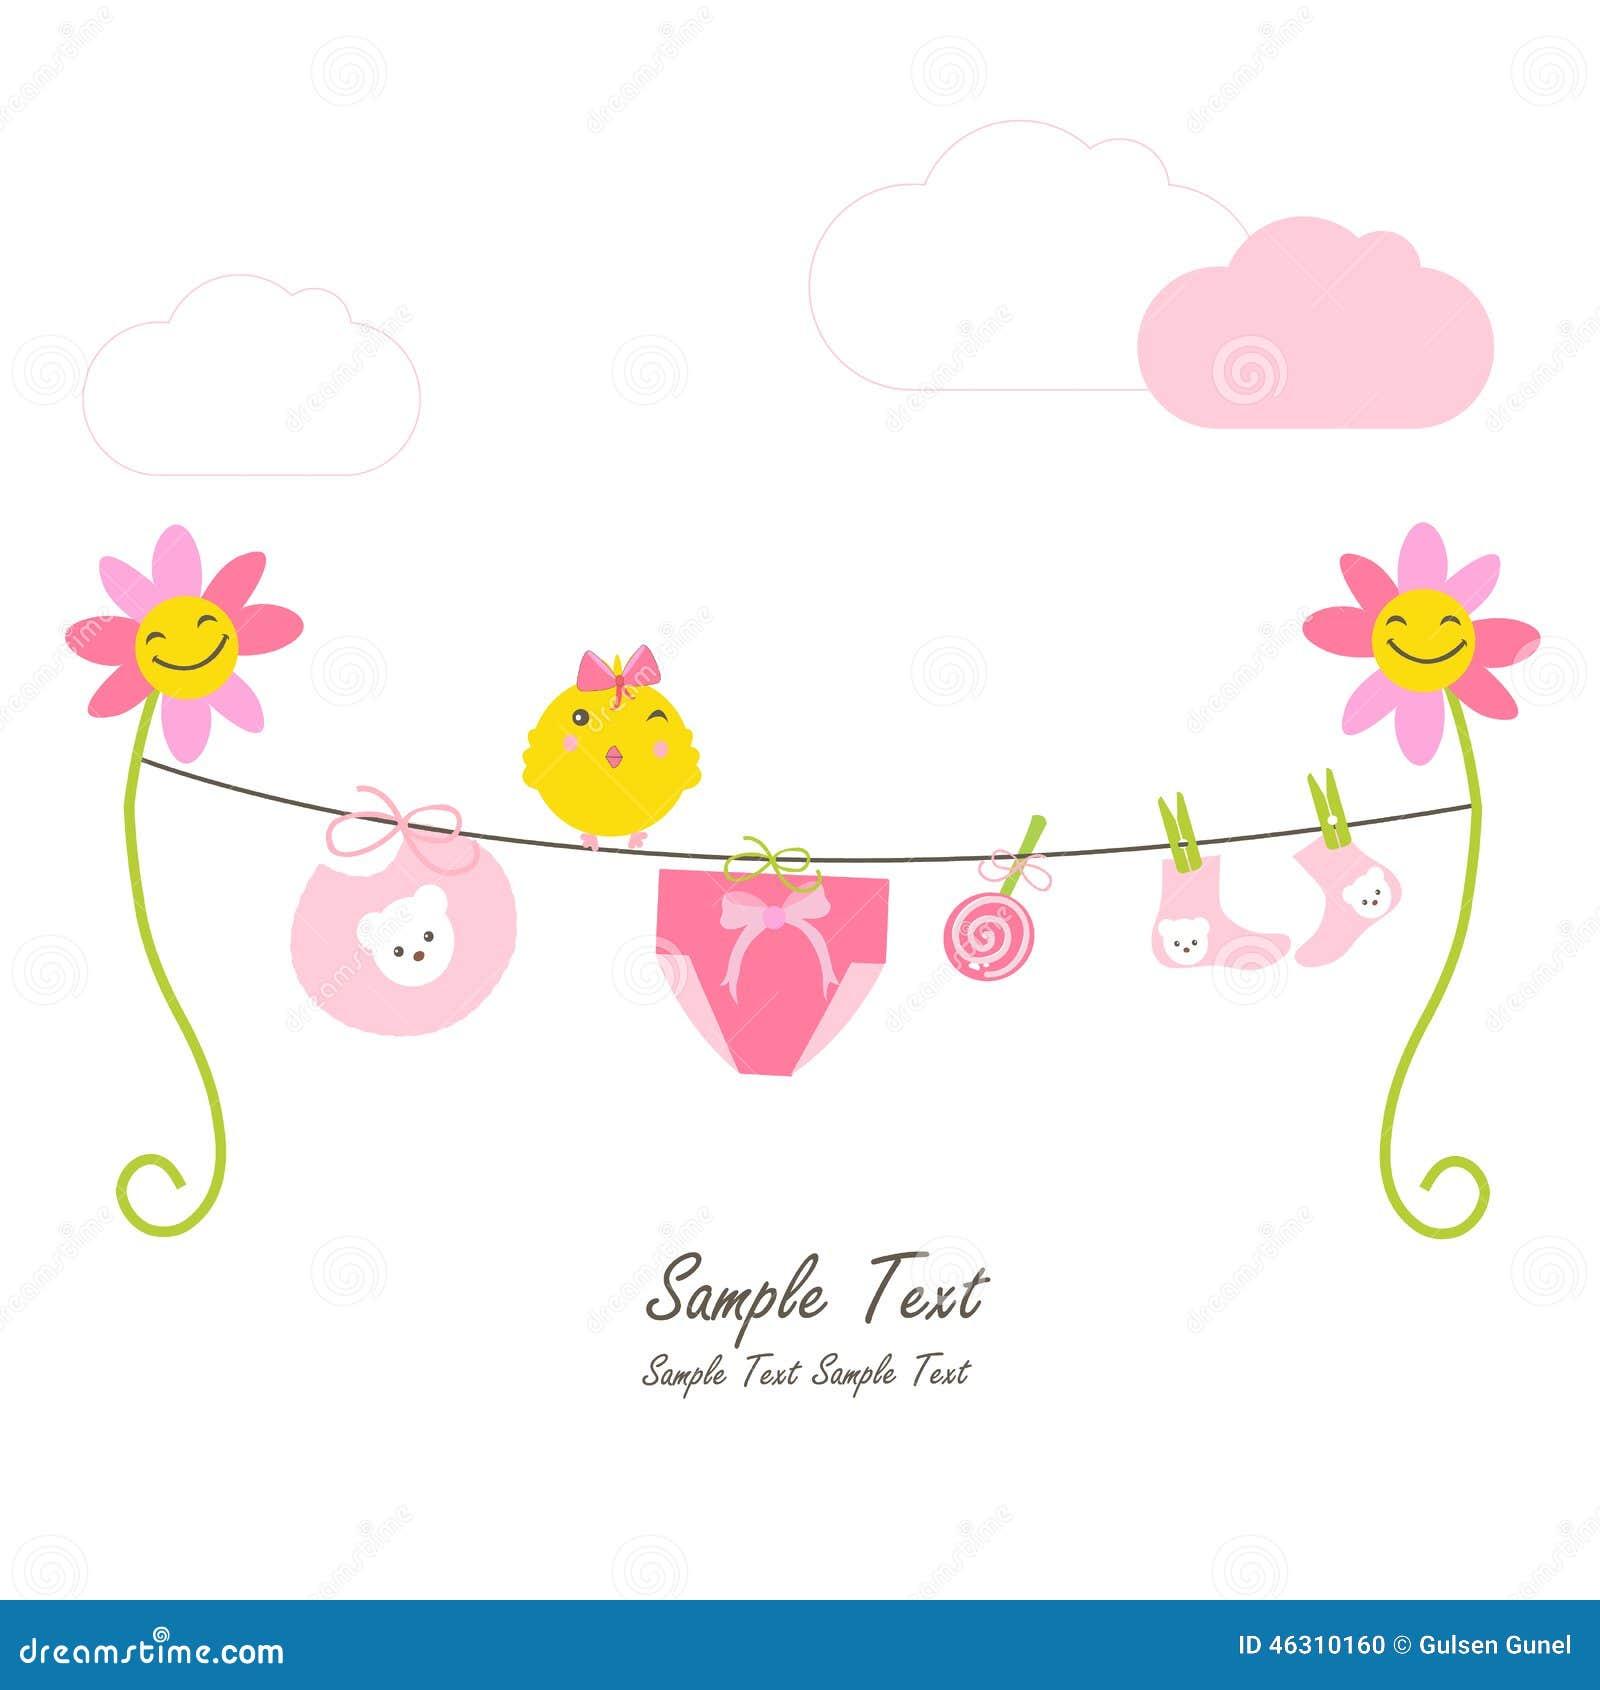 newborn baby girl flowers and hanging baby symbols stock